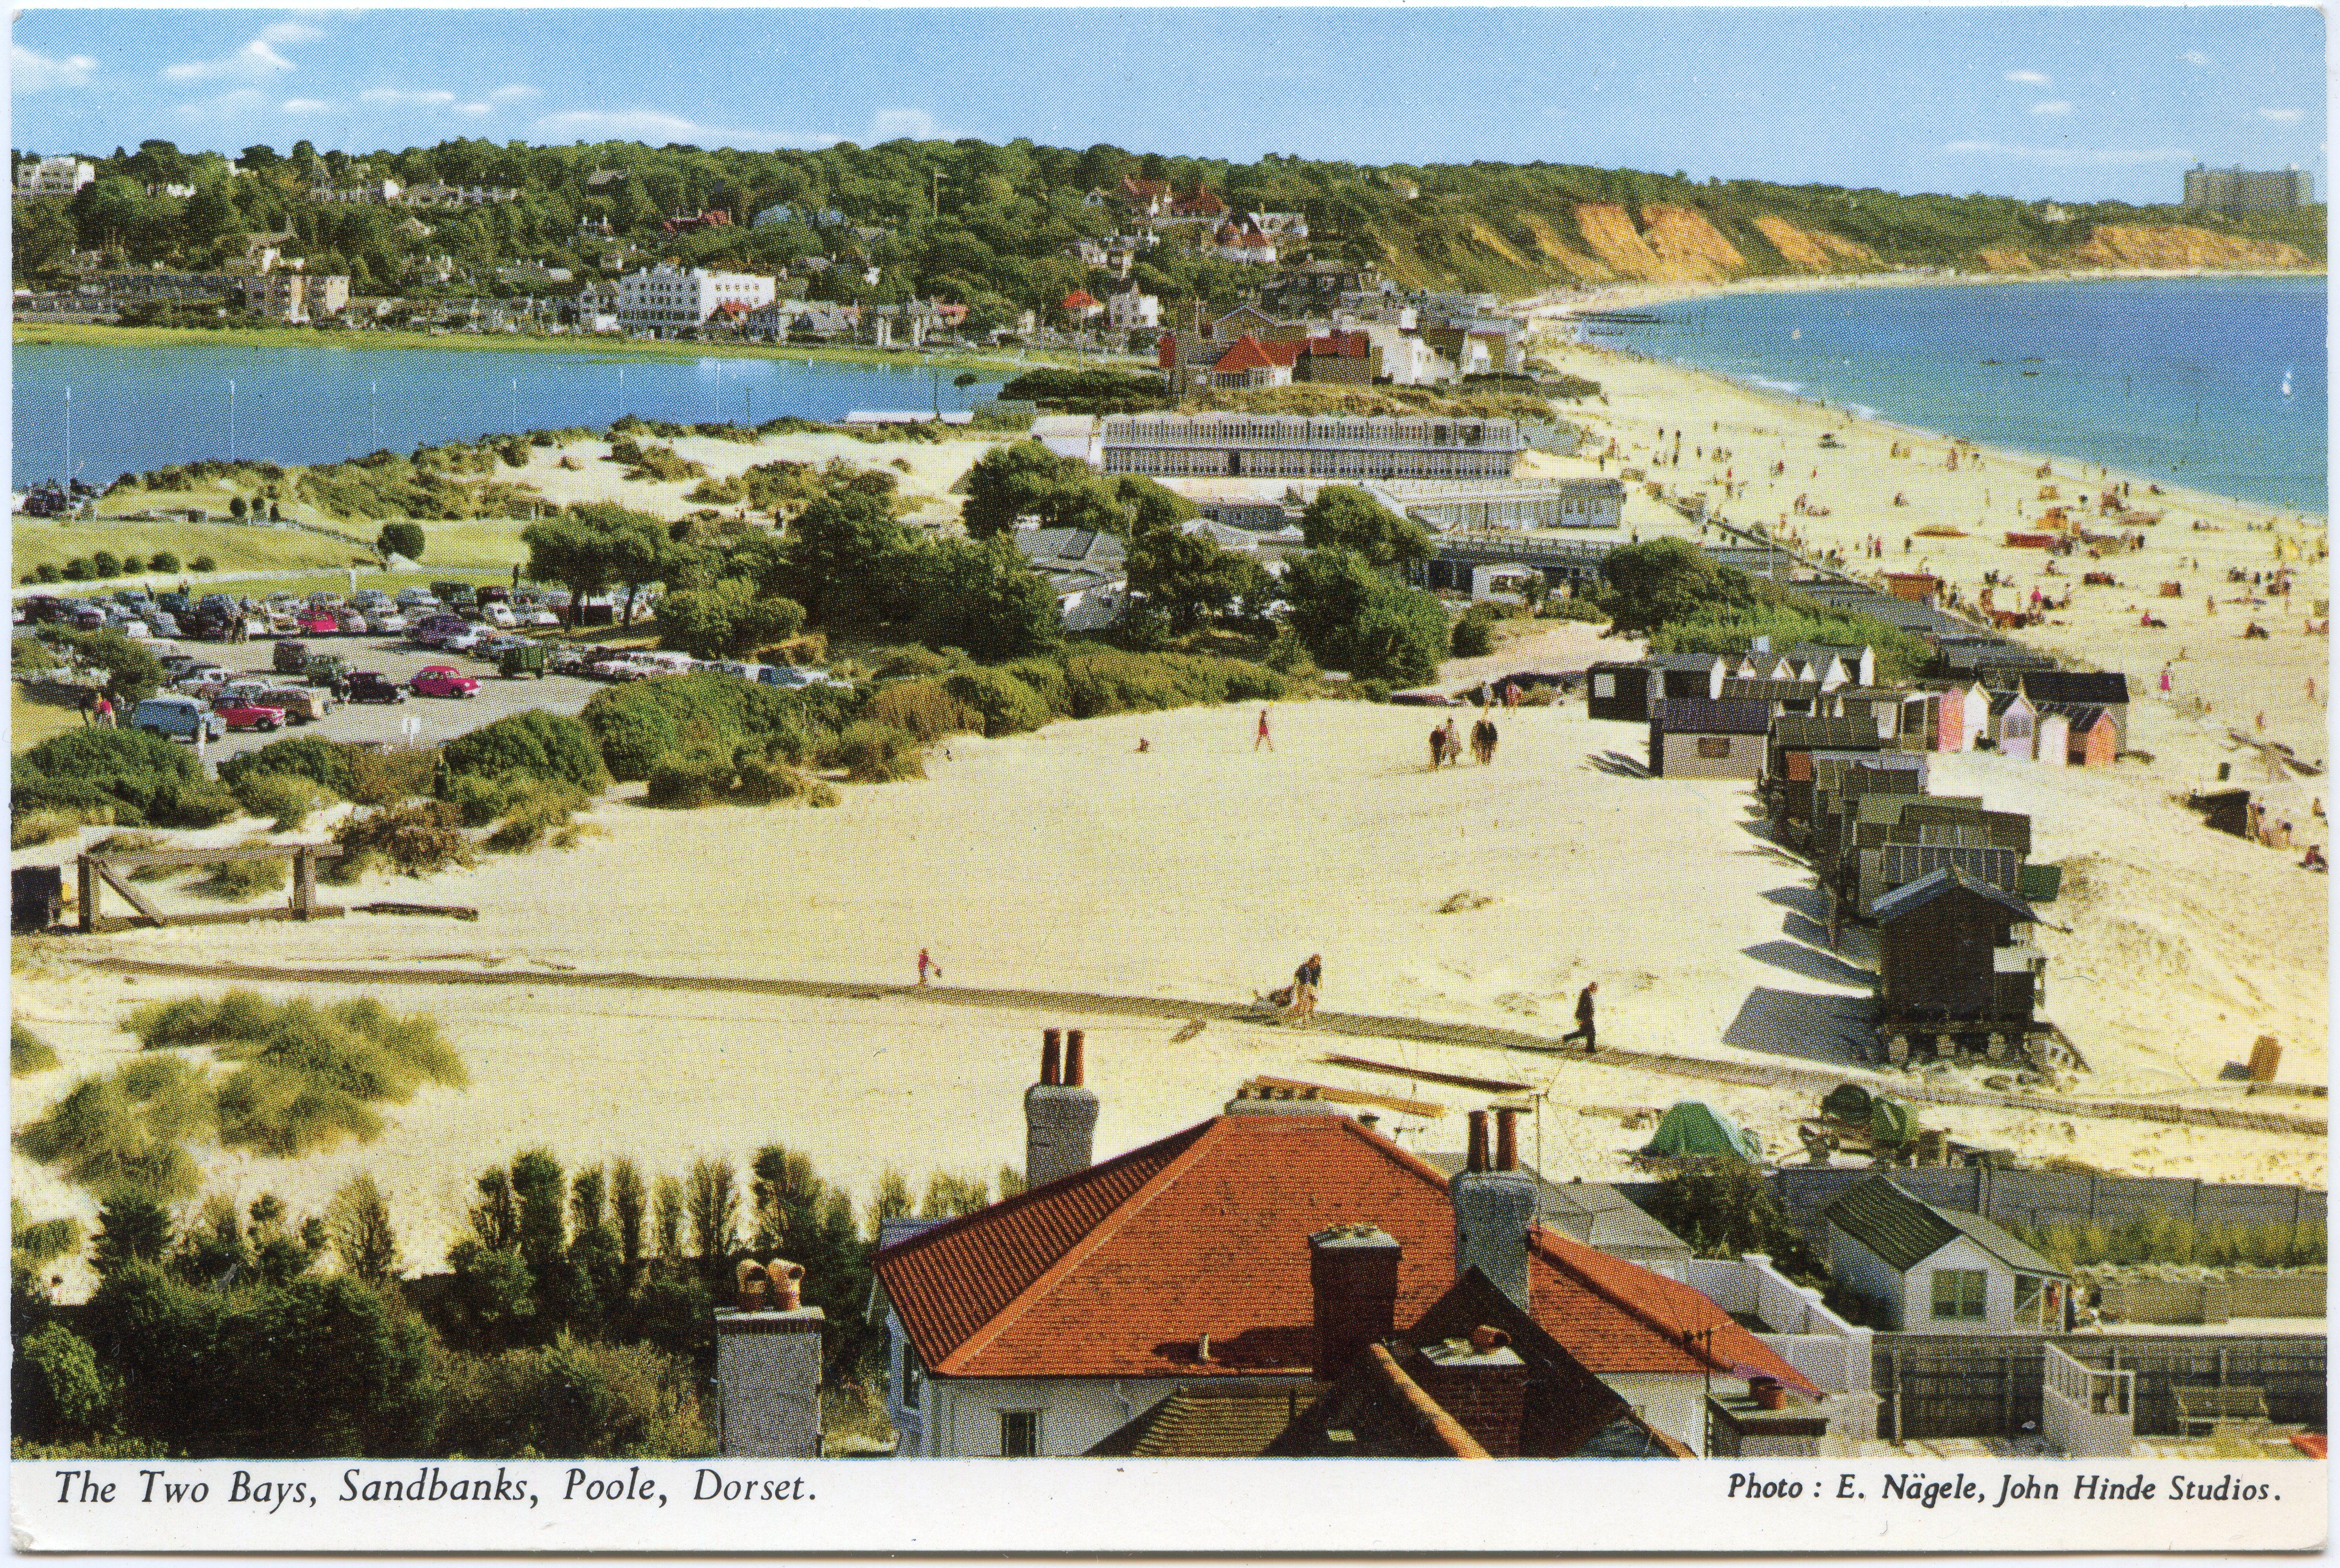 Sandbanks Poole Dorset Dorset Poole London Travel